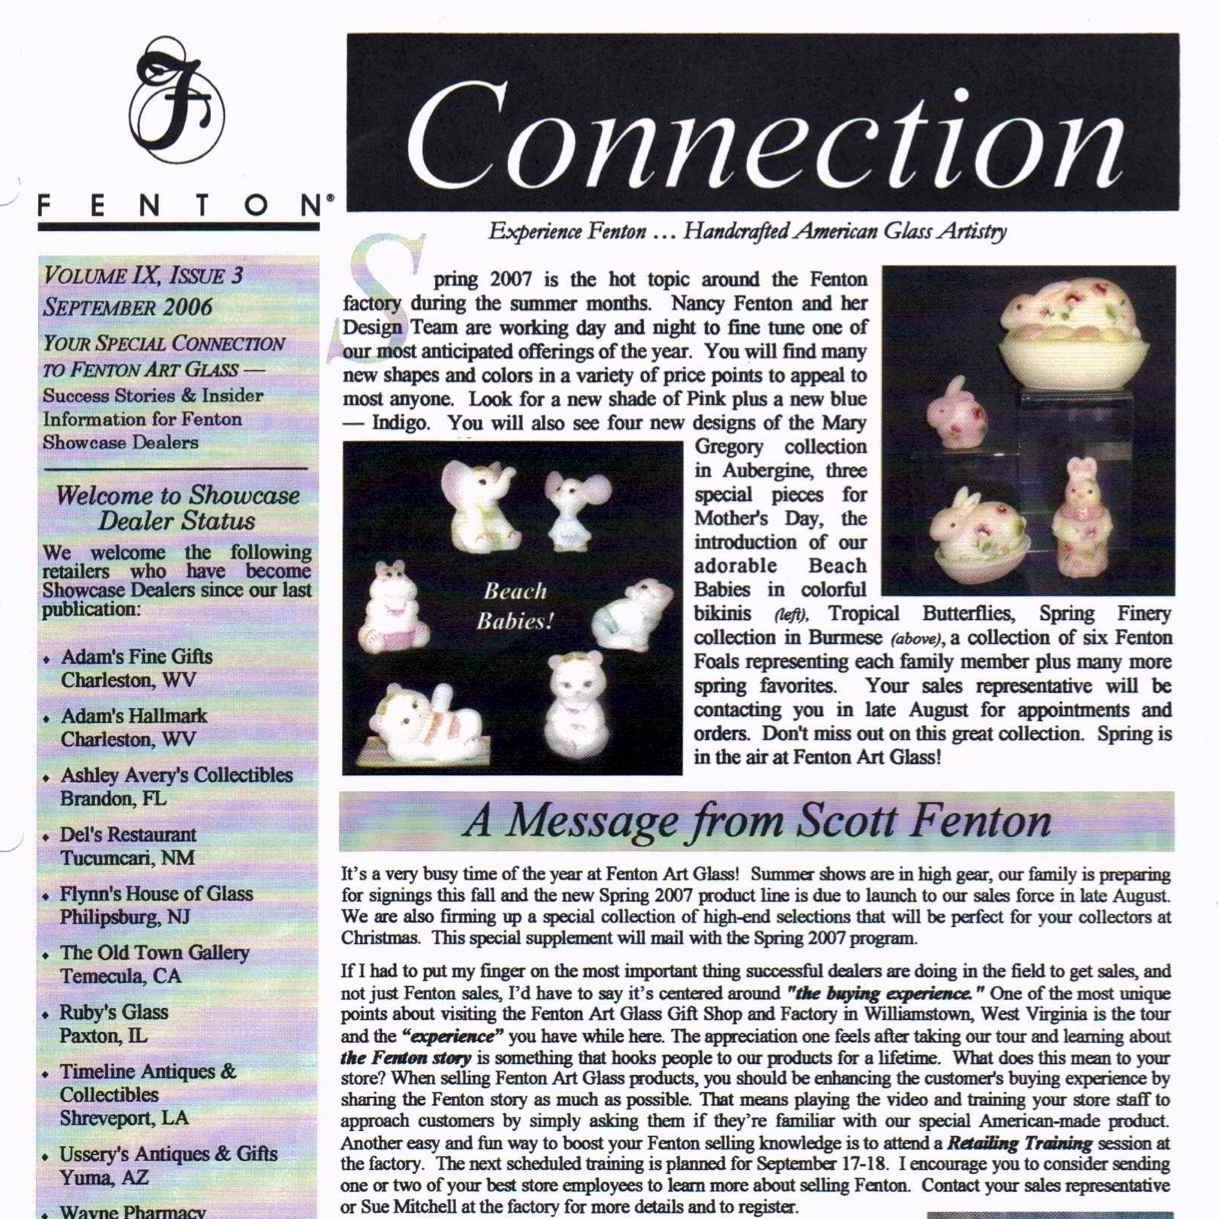 2006 Sept Fenton Connection